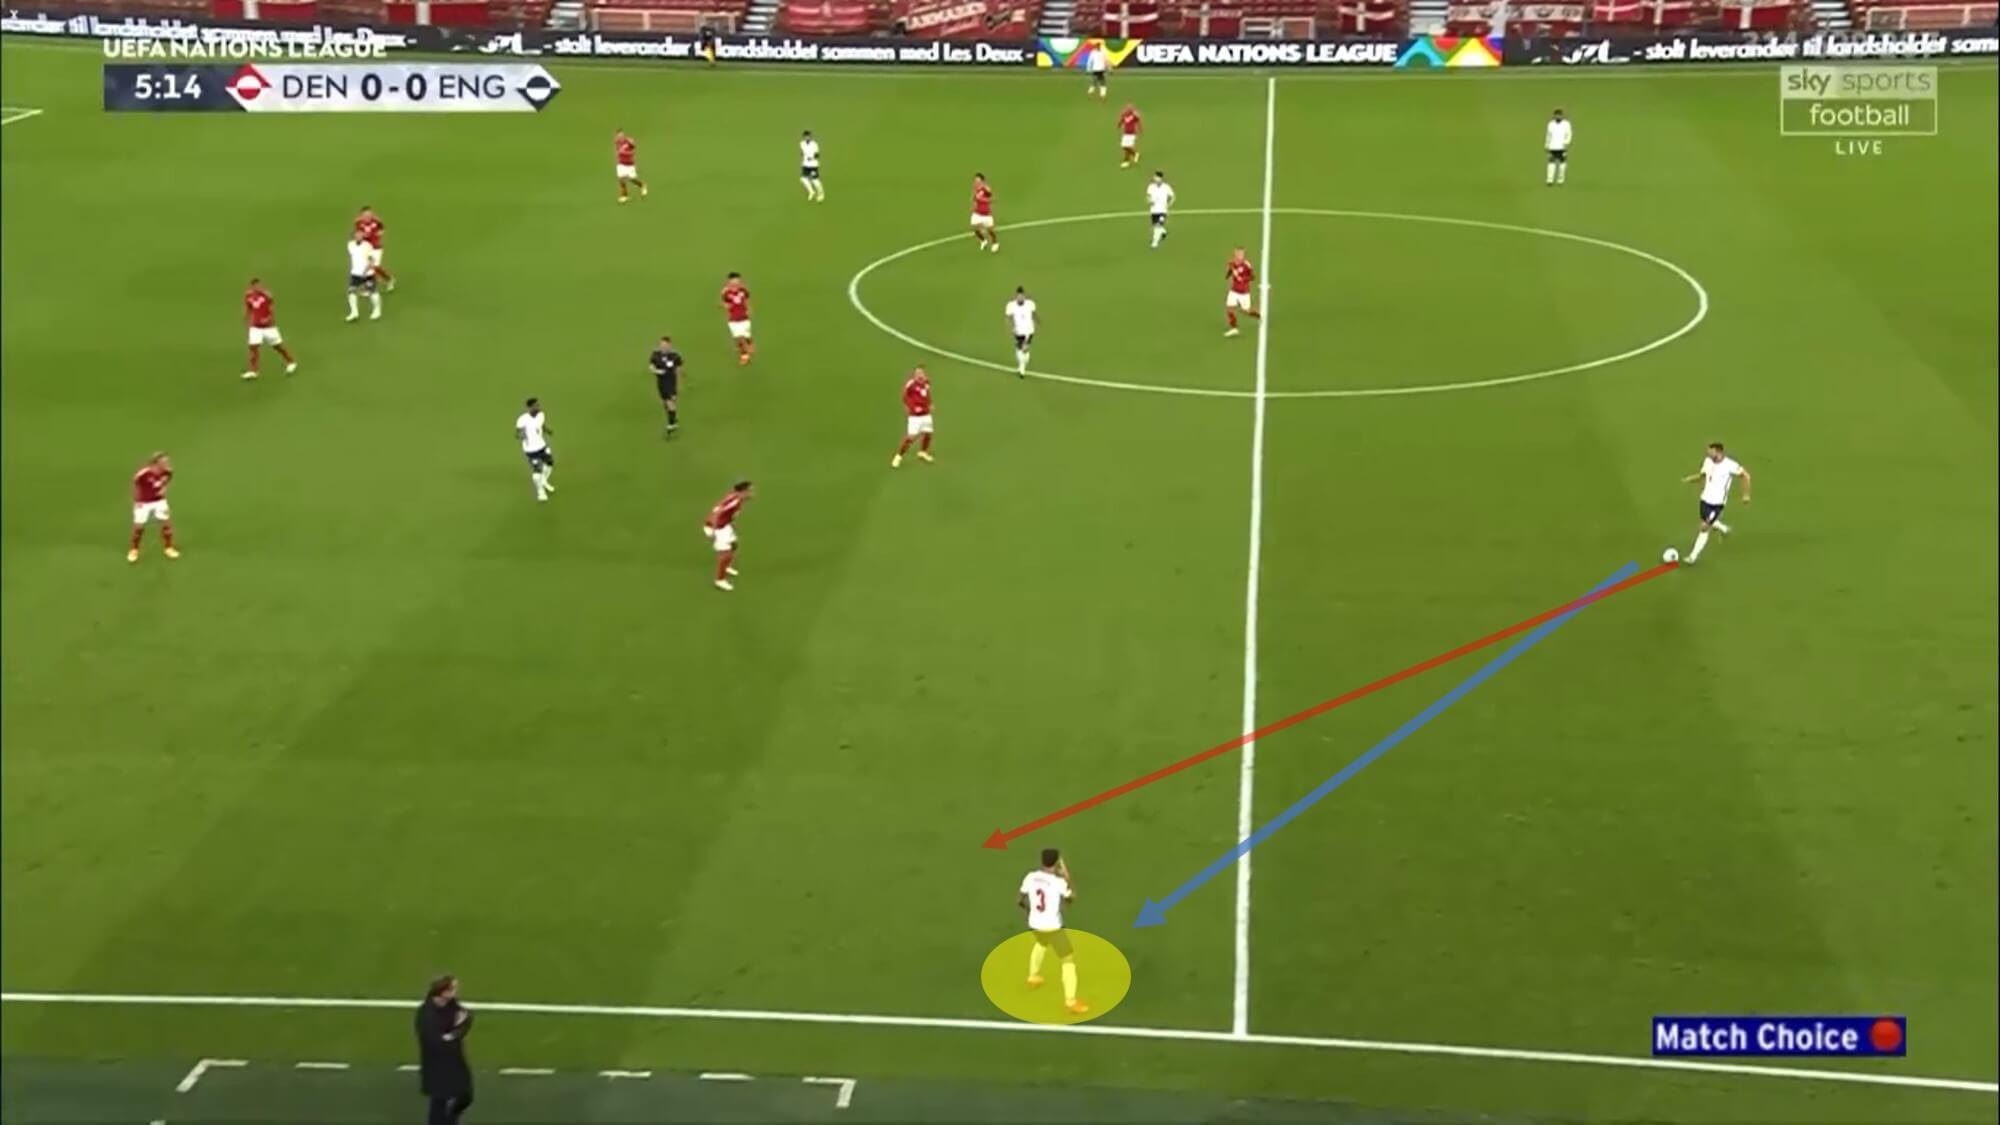 UEFA Nations League 2020/21: Denmark v England - tactical analysis tactics